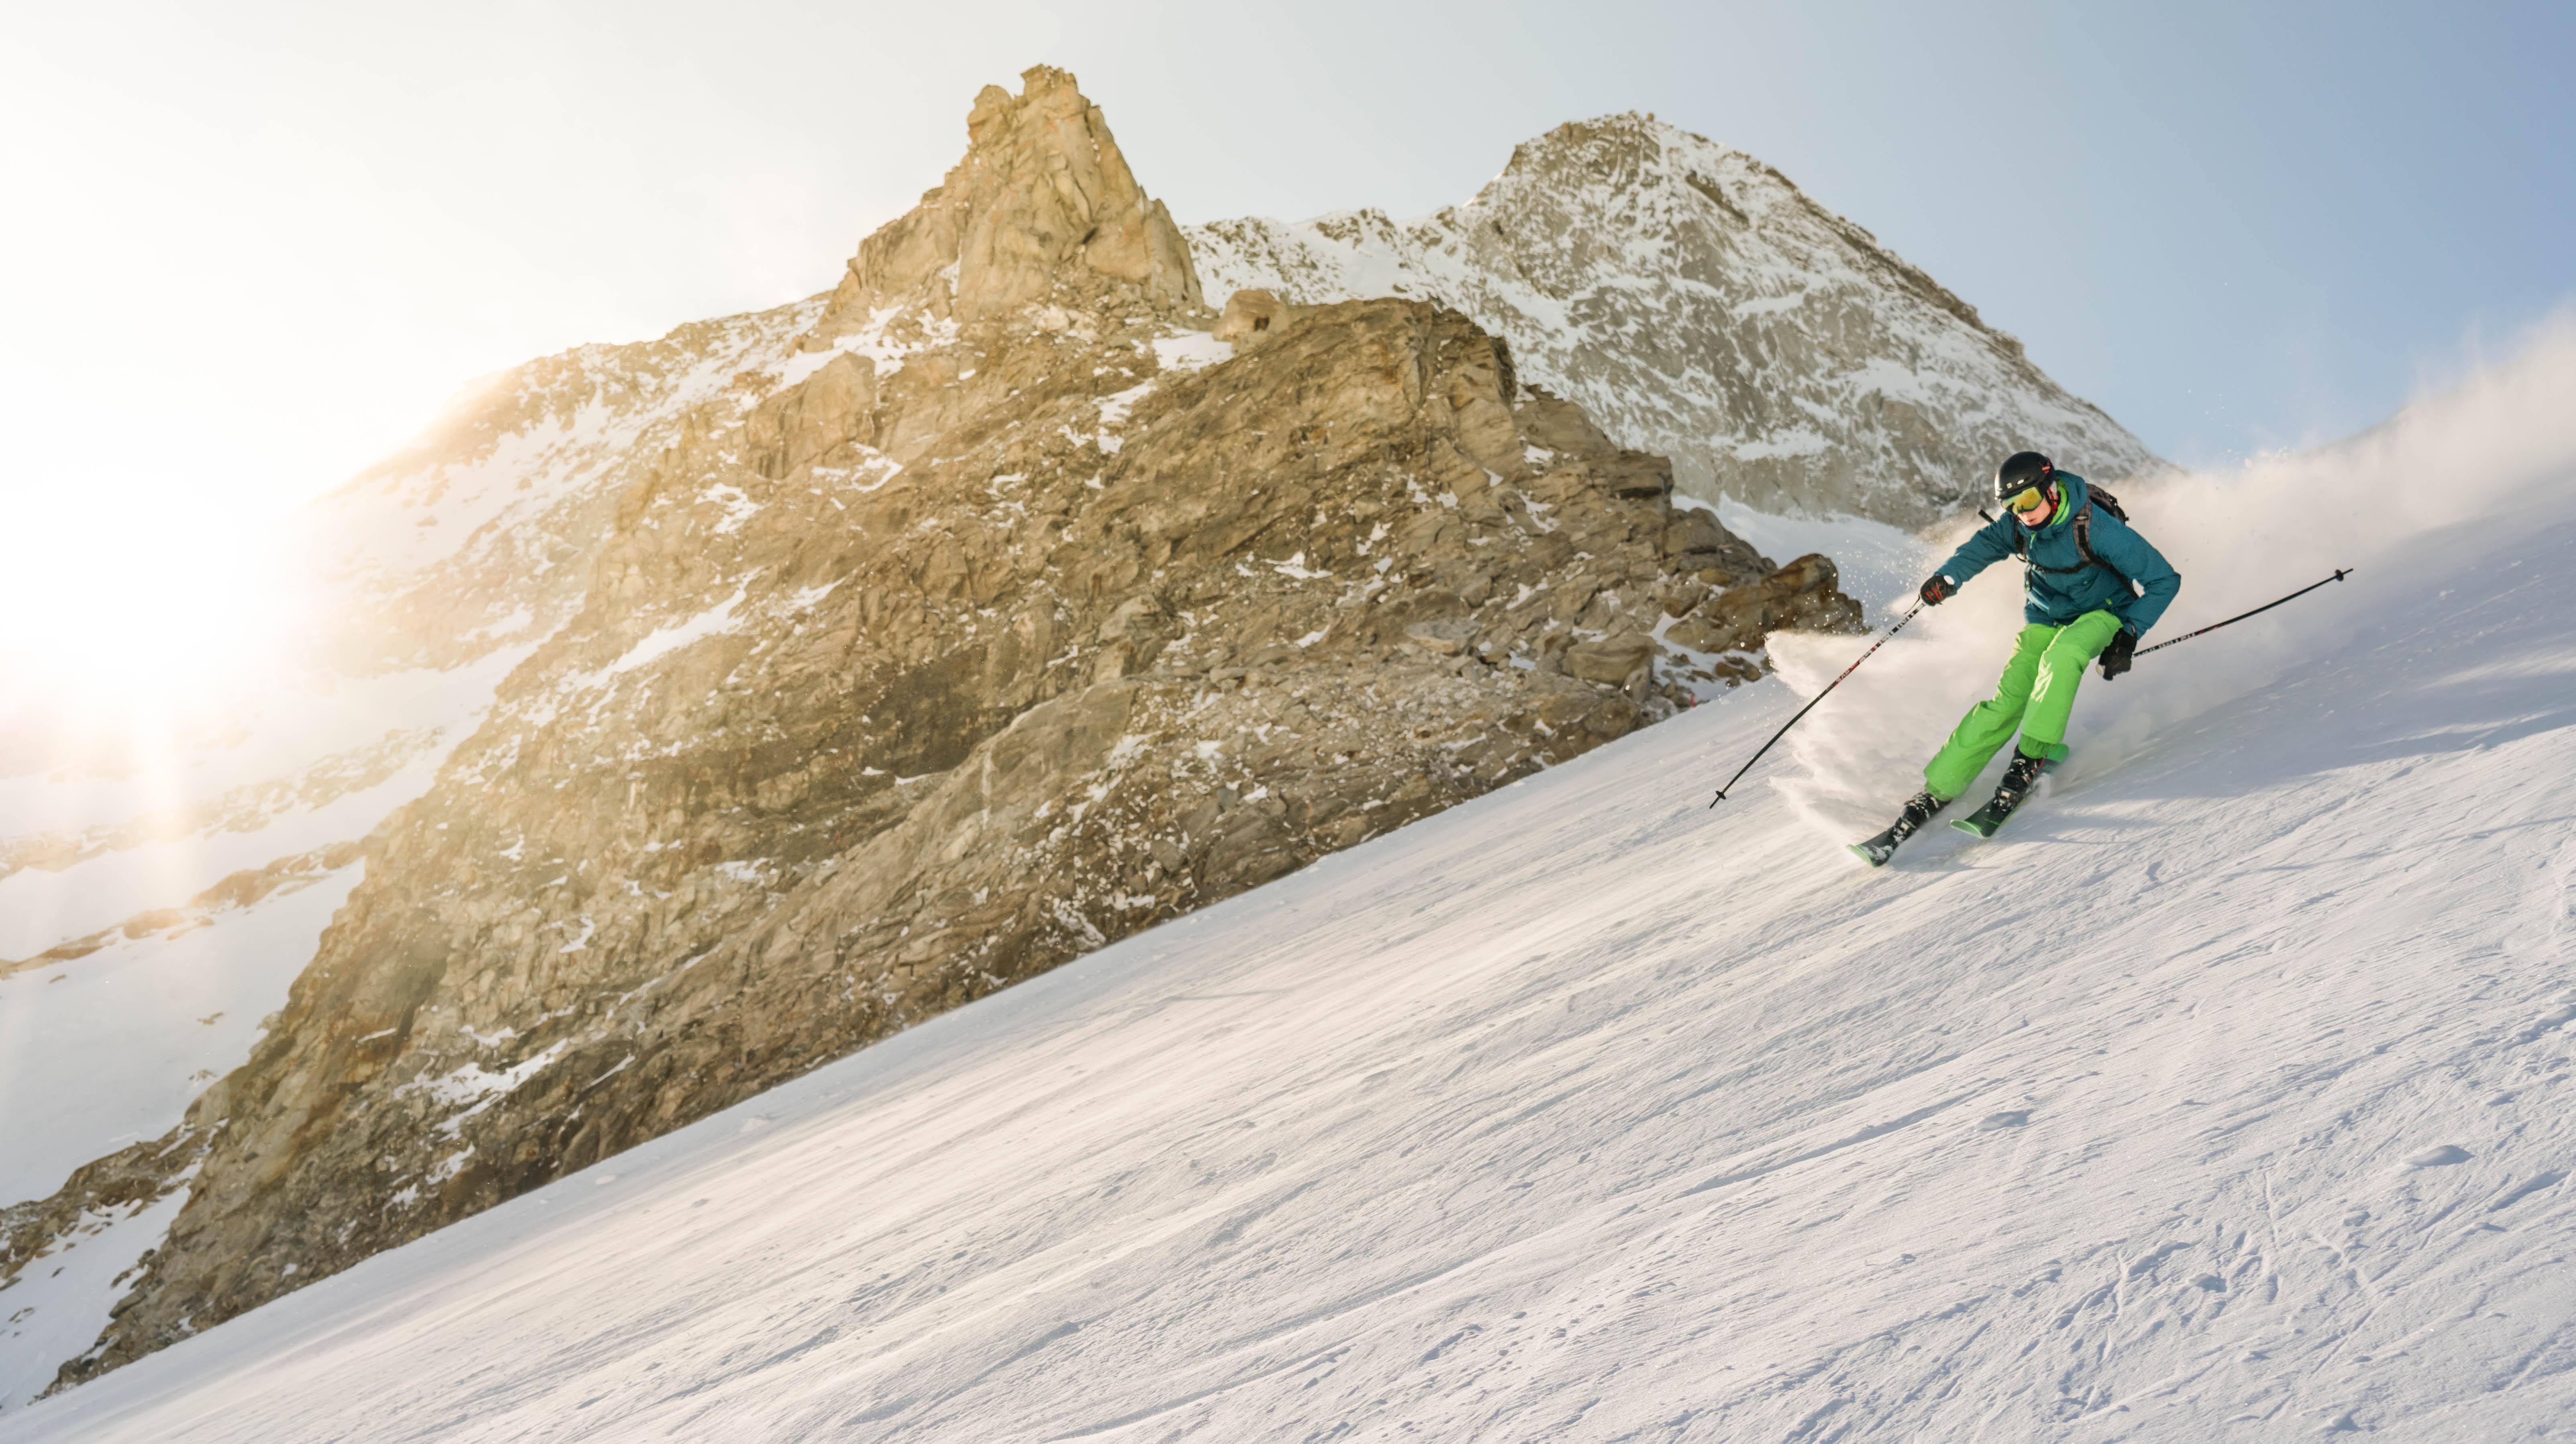 man ski boarding during daytiem